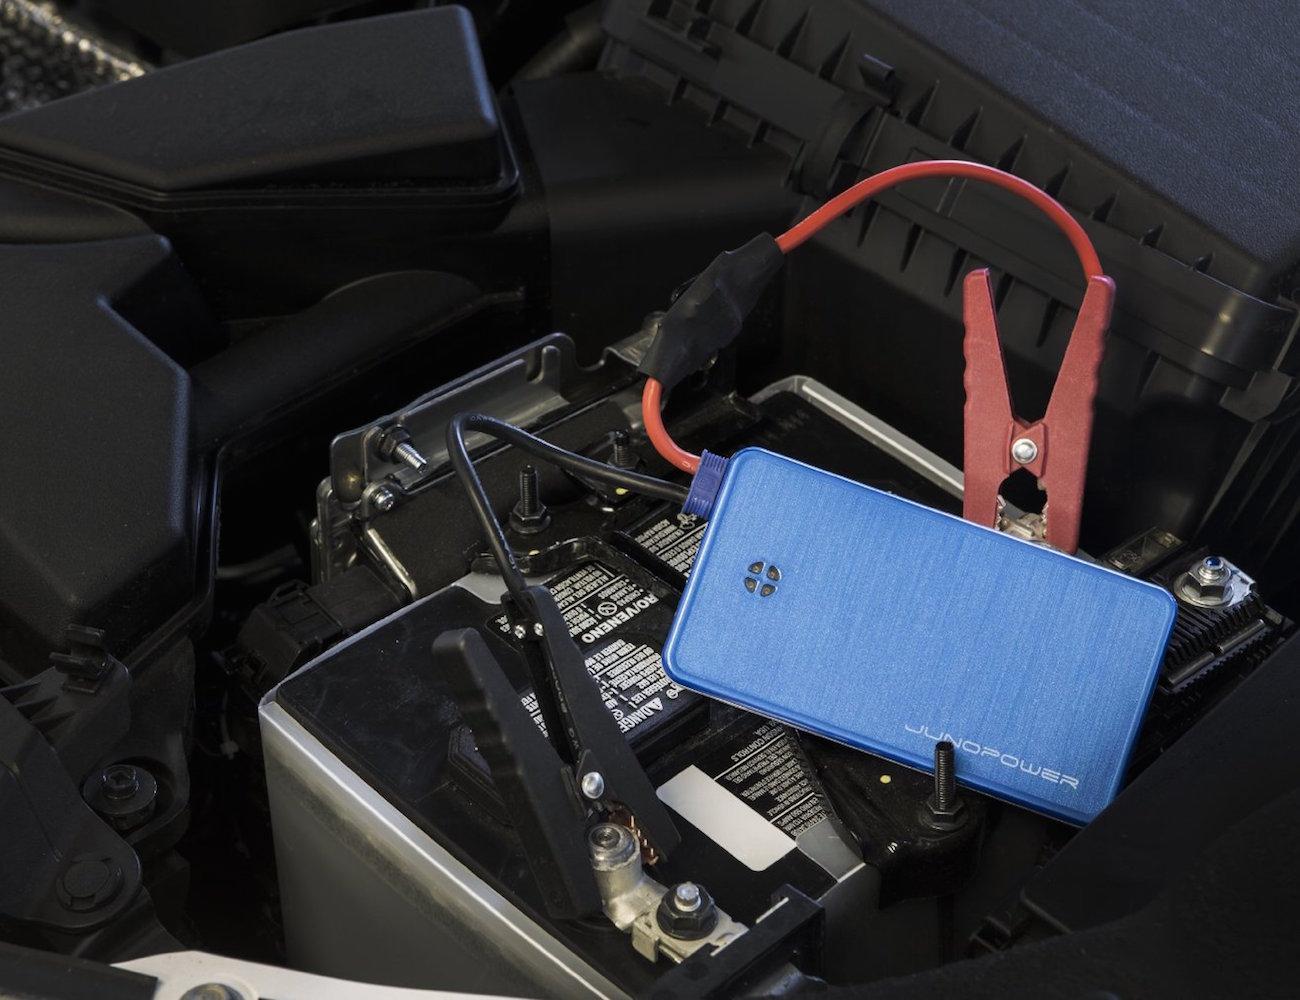 JUNOJUMPR+%26%238211%3B+Pocket-Size+Car+Battery+Jump+Starter+And+Portable+Charger